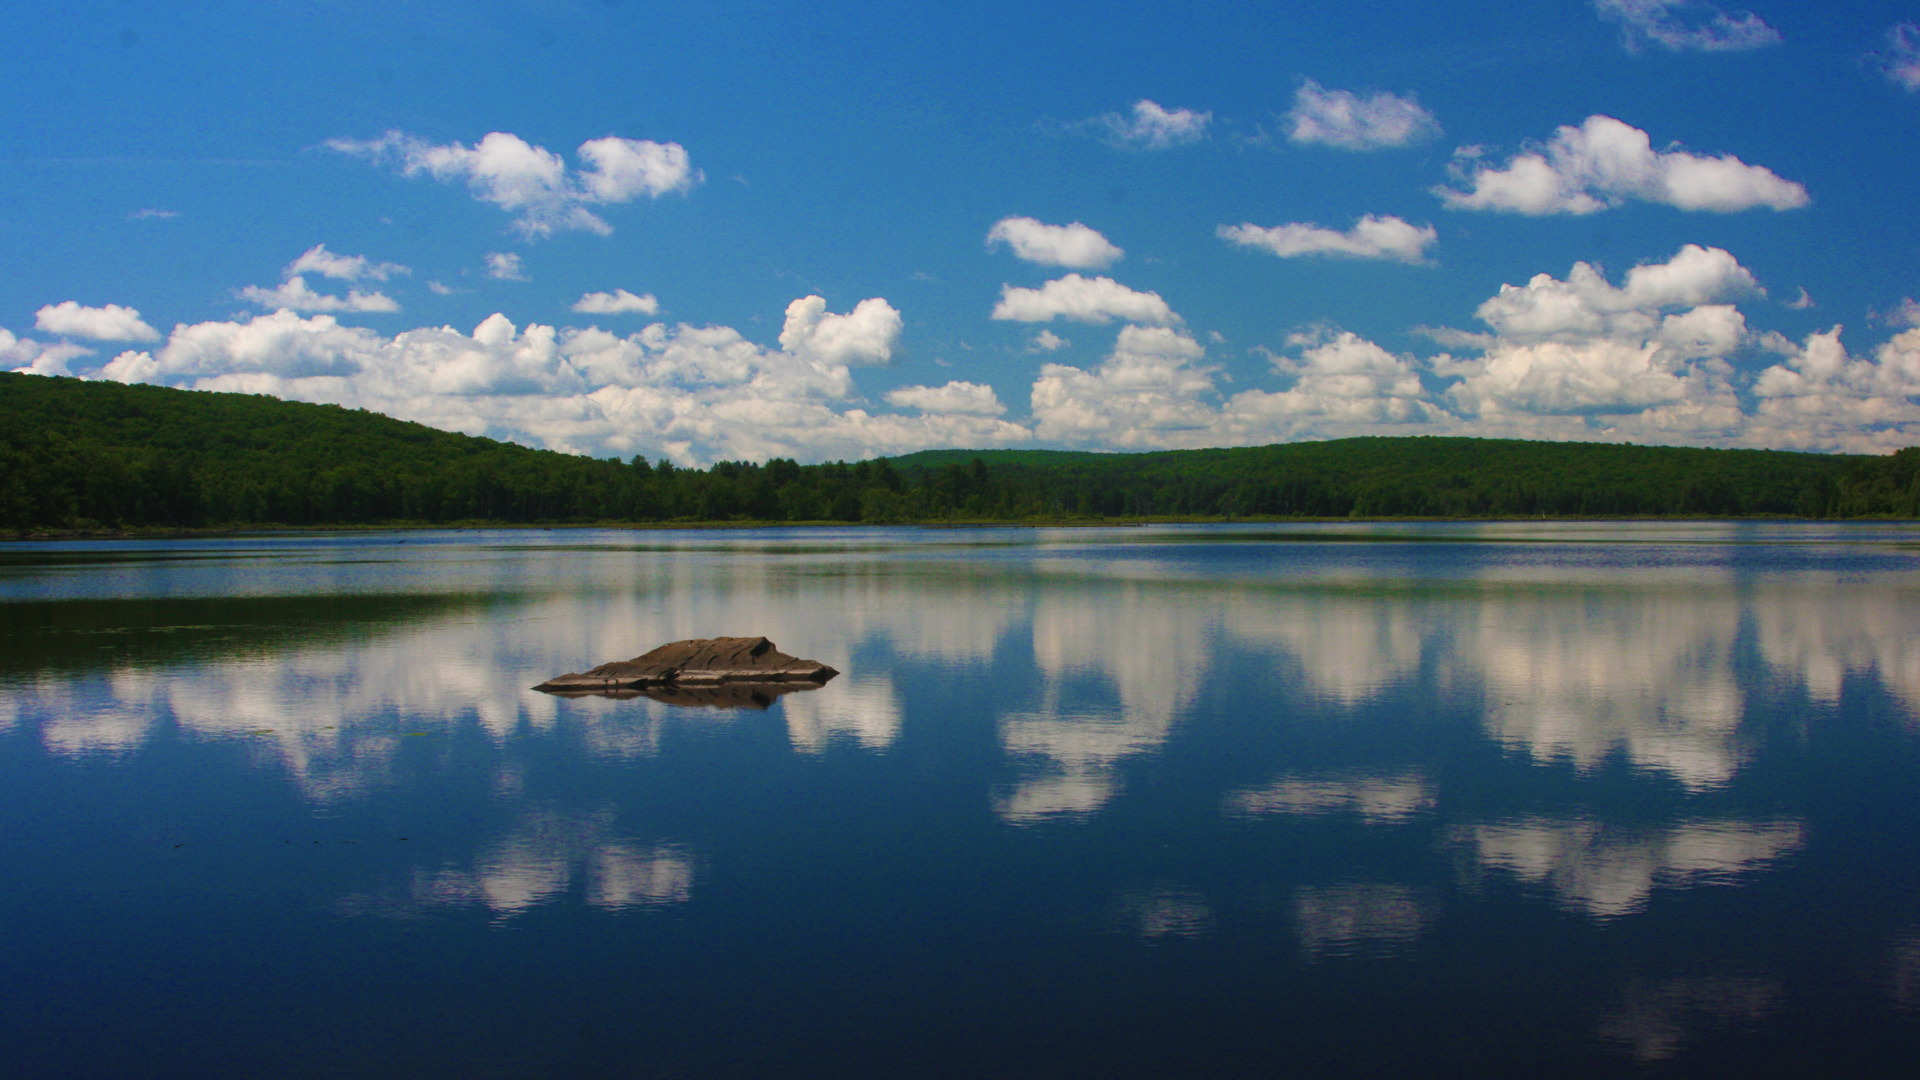 Still life lake reflection